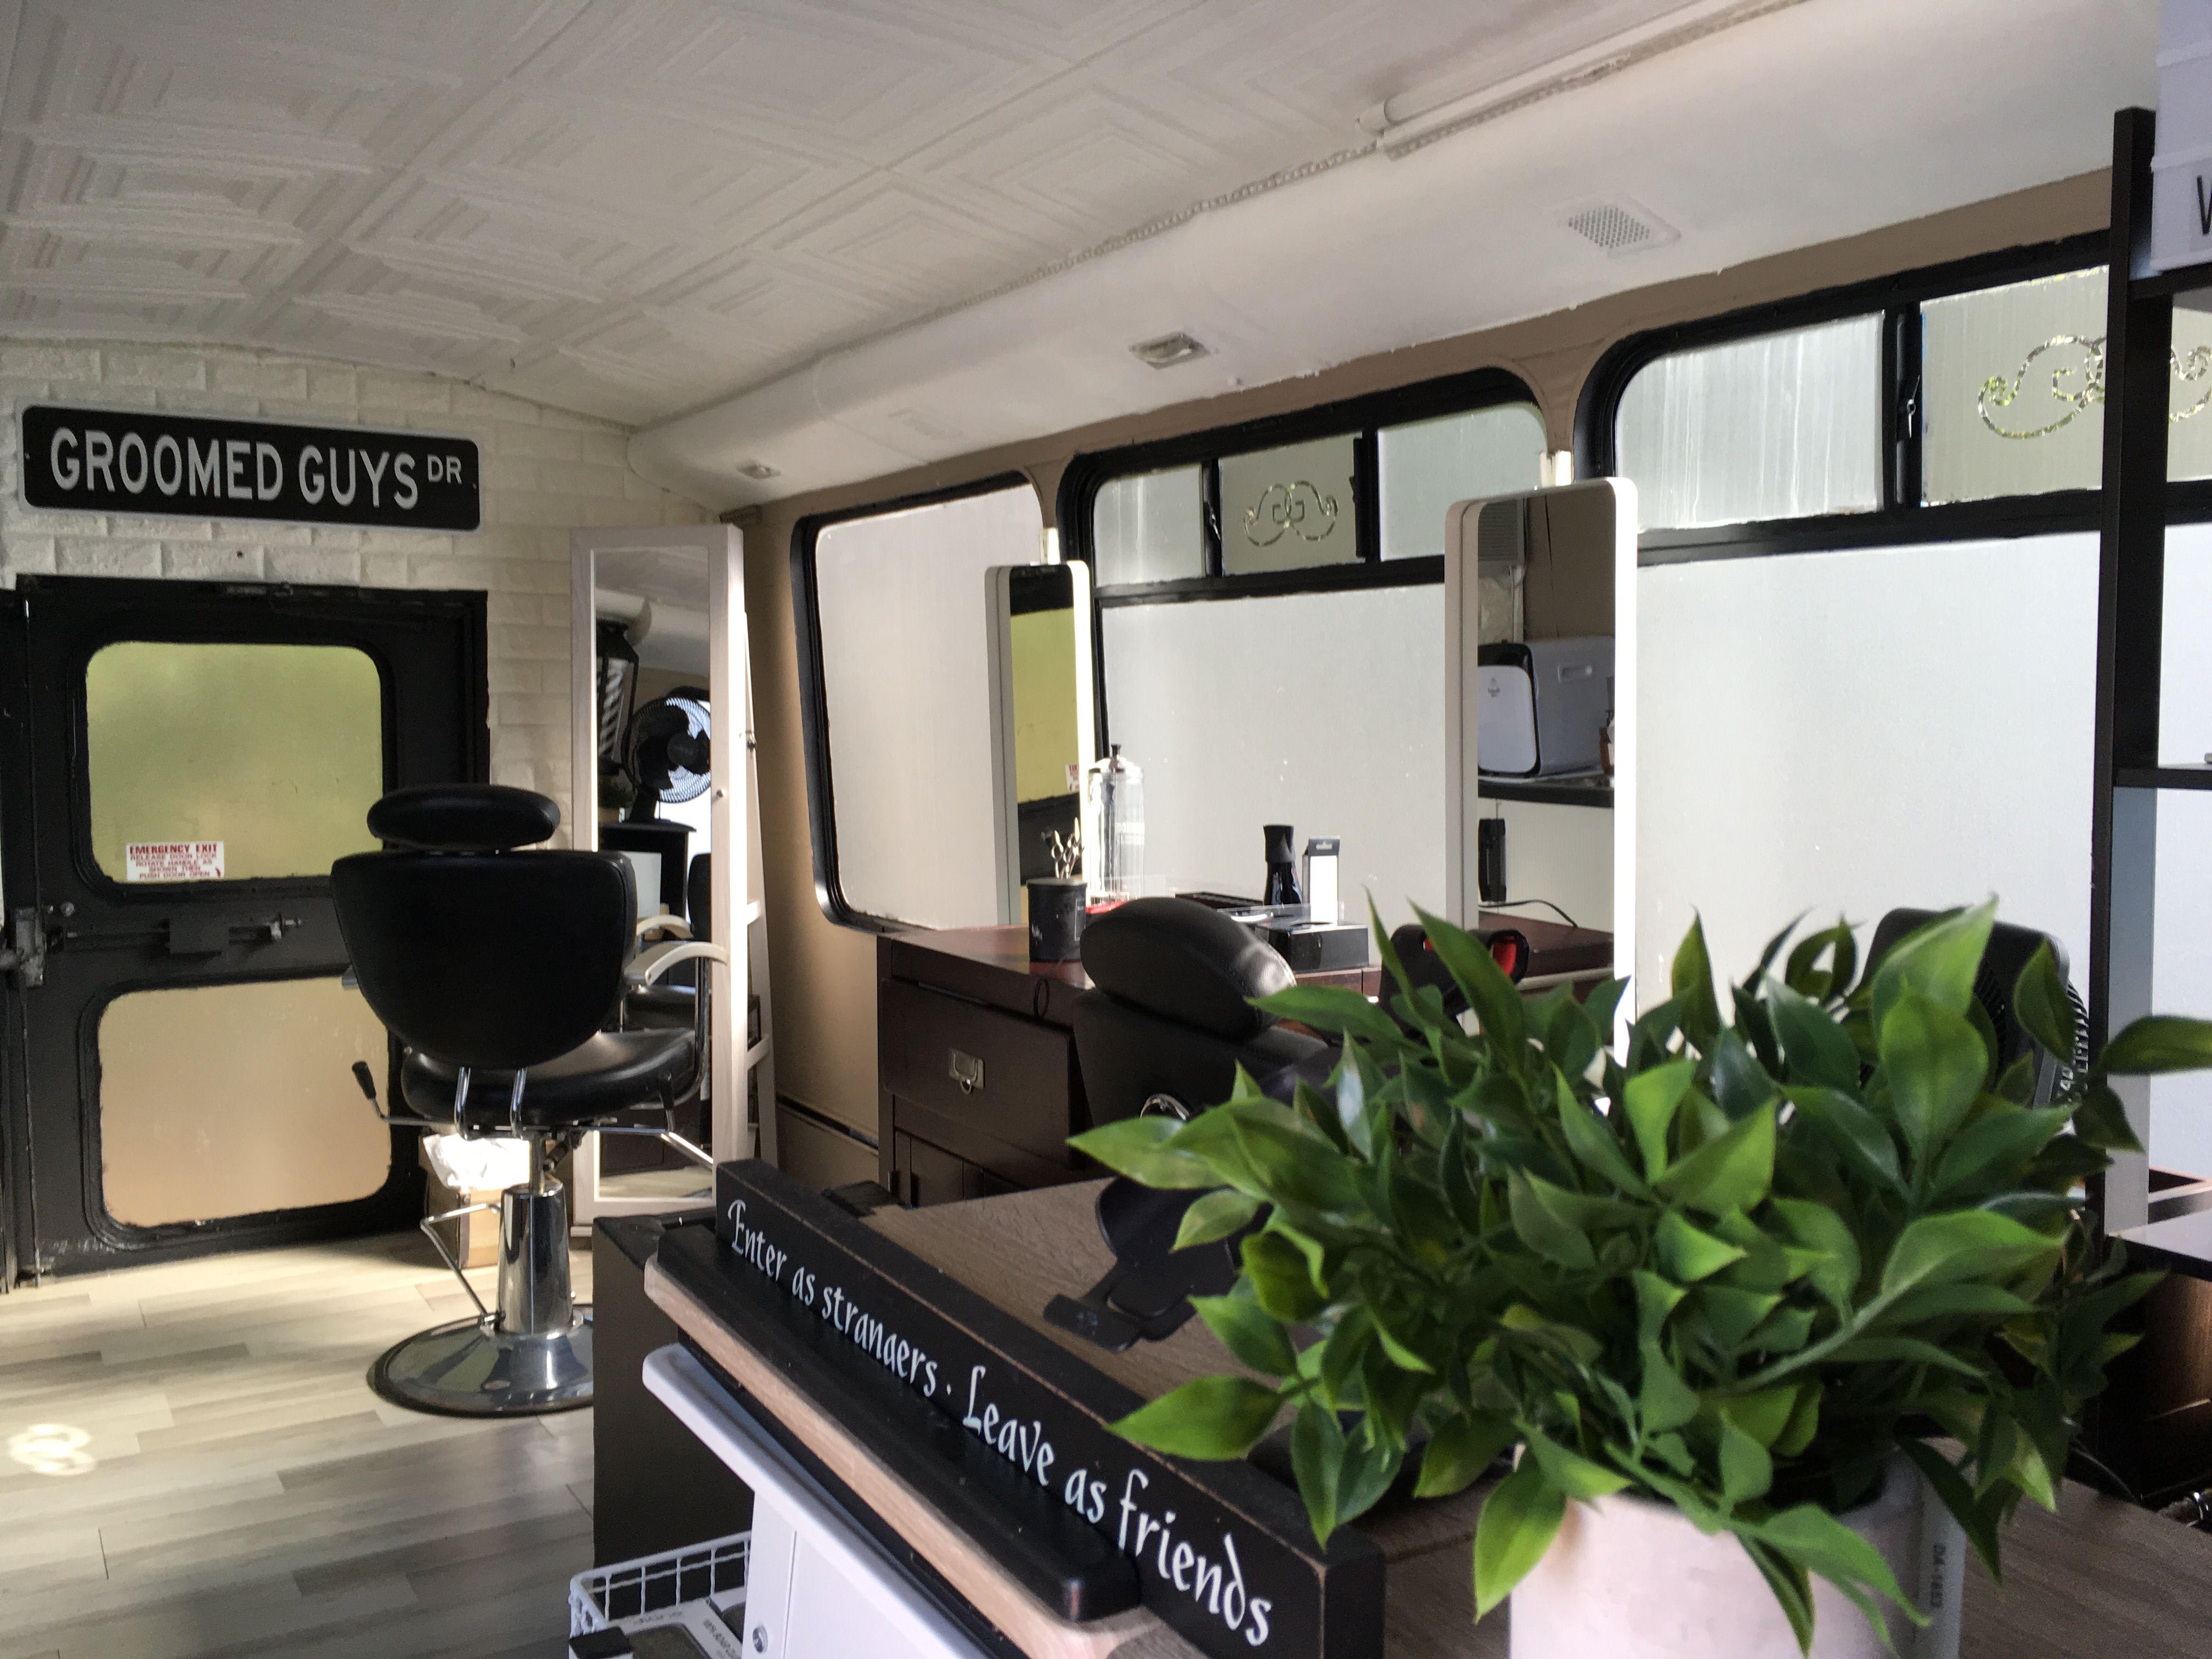 Classic barbershop on wheels 2019 design  Weddings and